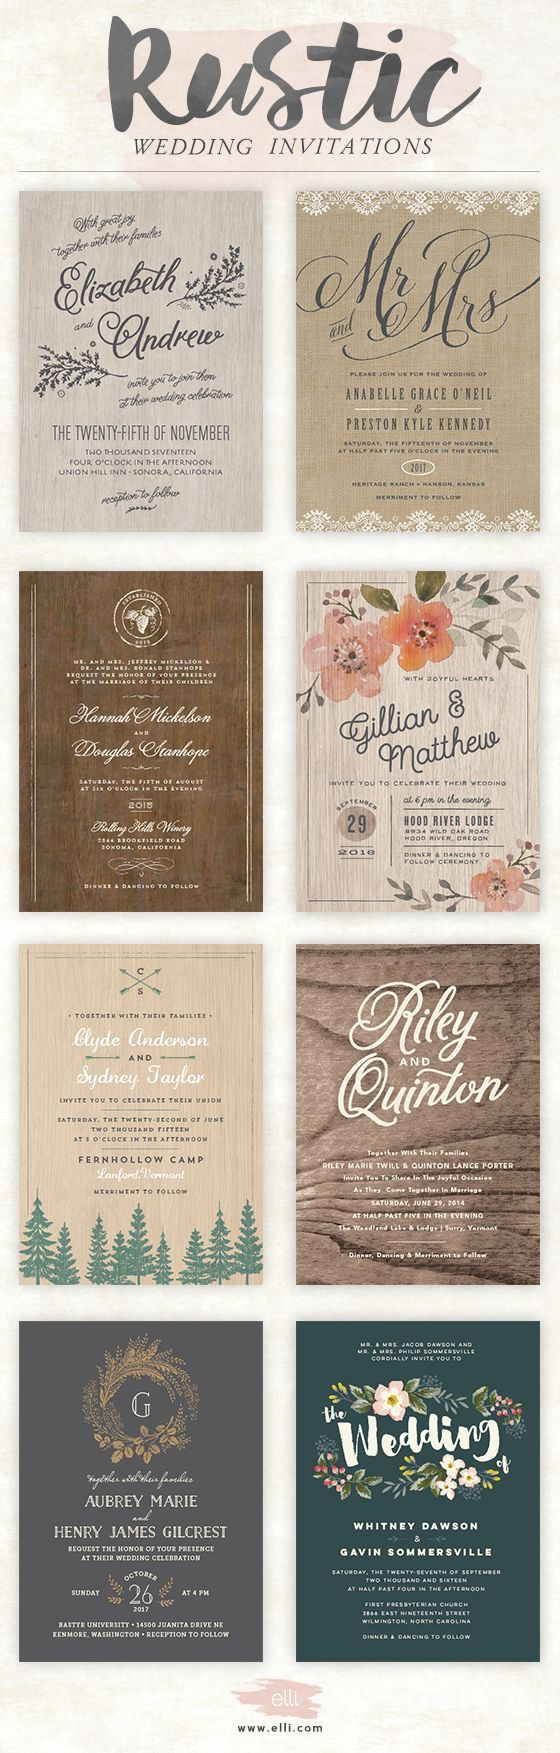 rustic wedding invitations photo wedding invitations Rustic wedding invitations bellacollina com Bella Collina Weddings